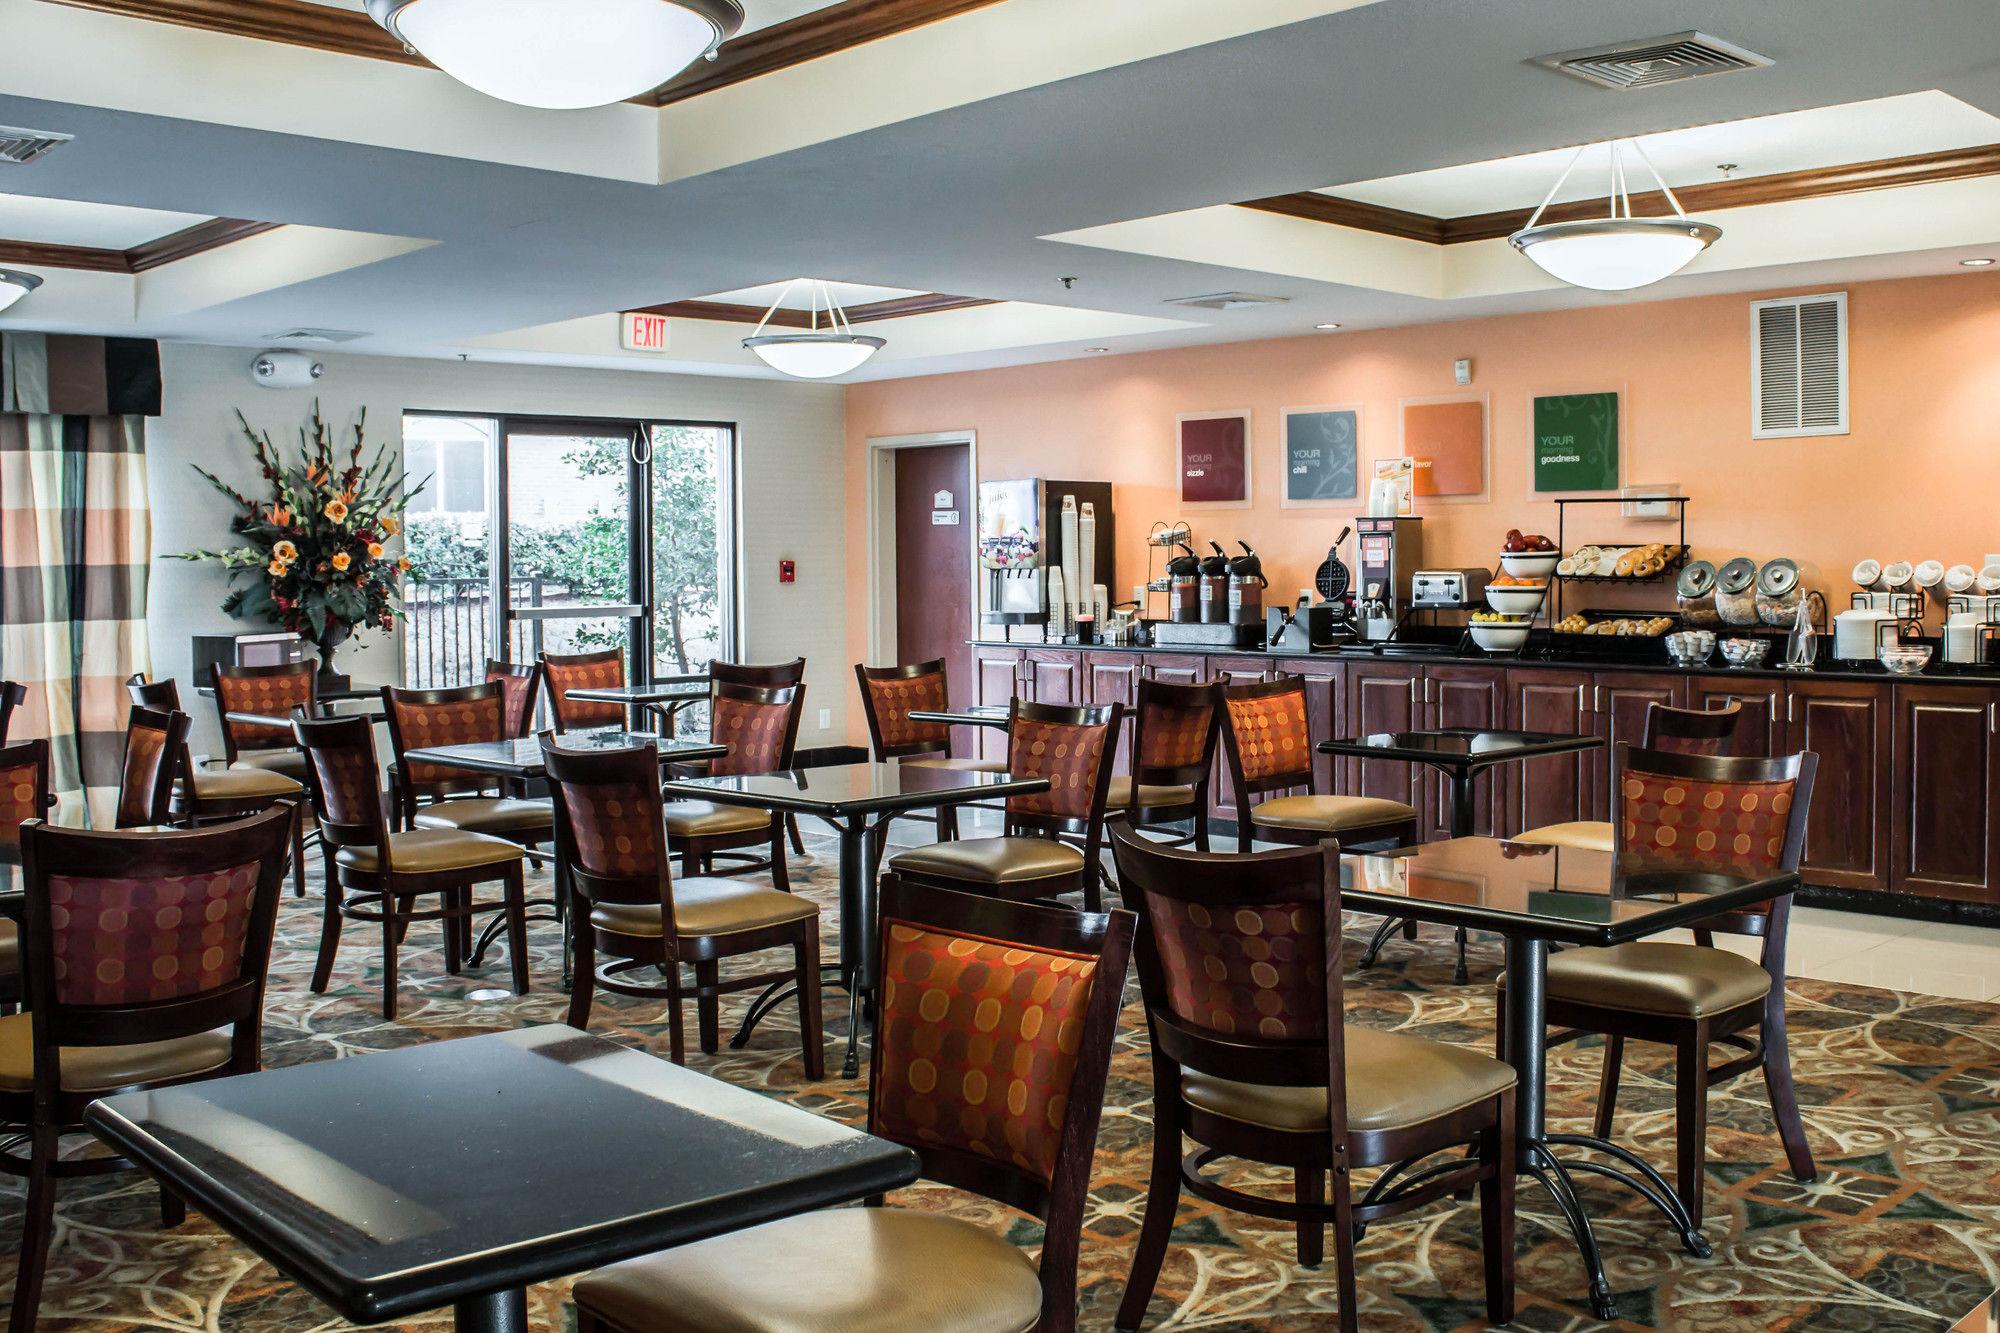 Comfort Inn in Smithfield, NC